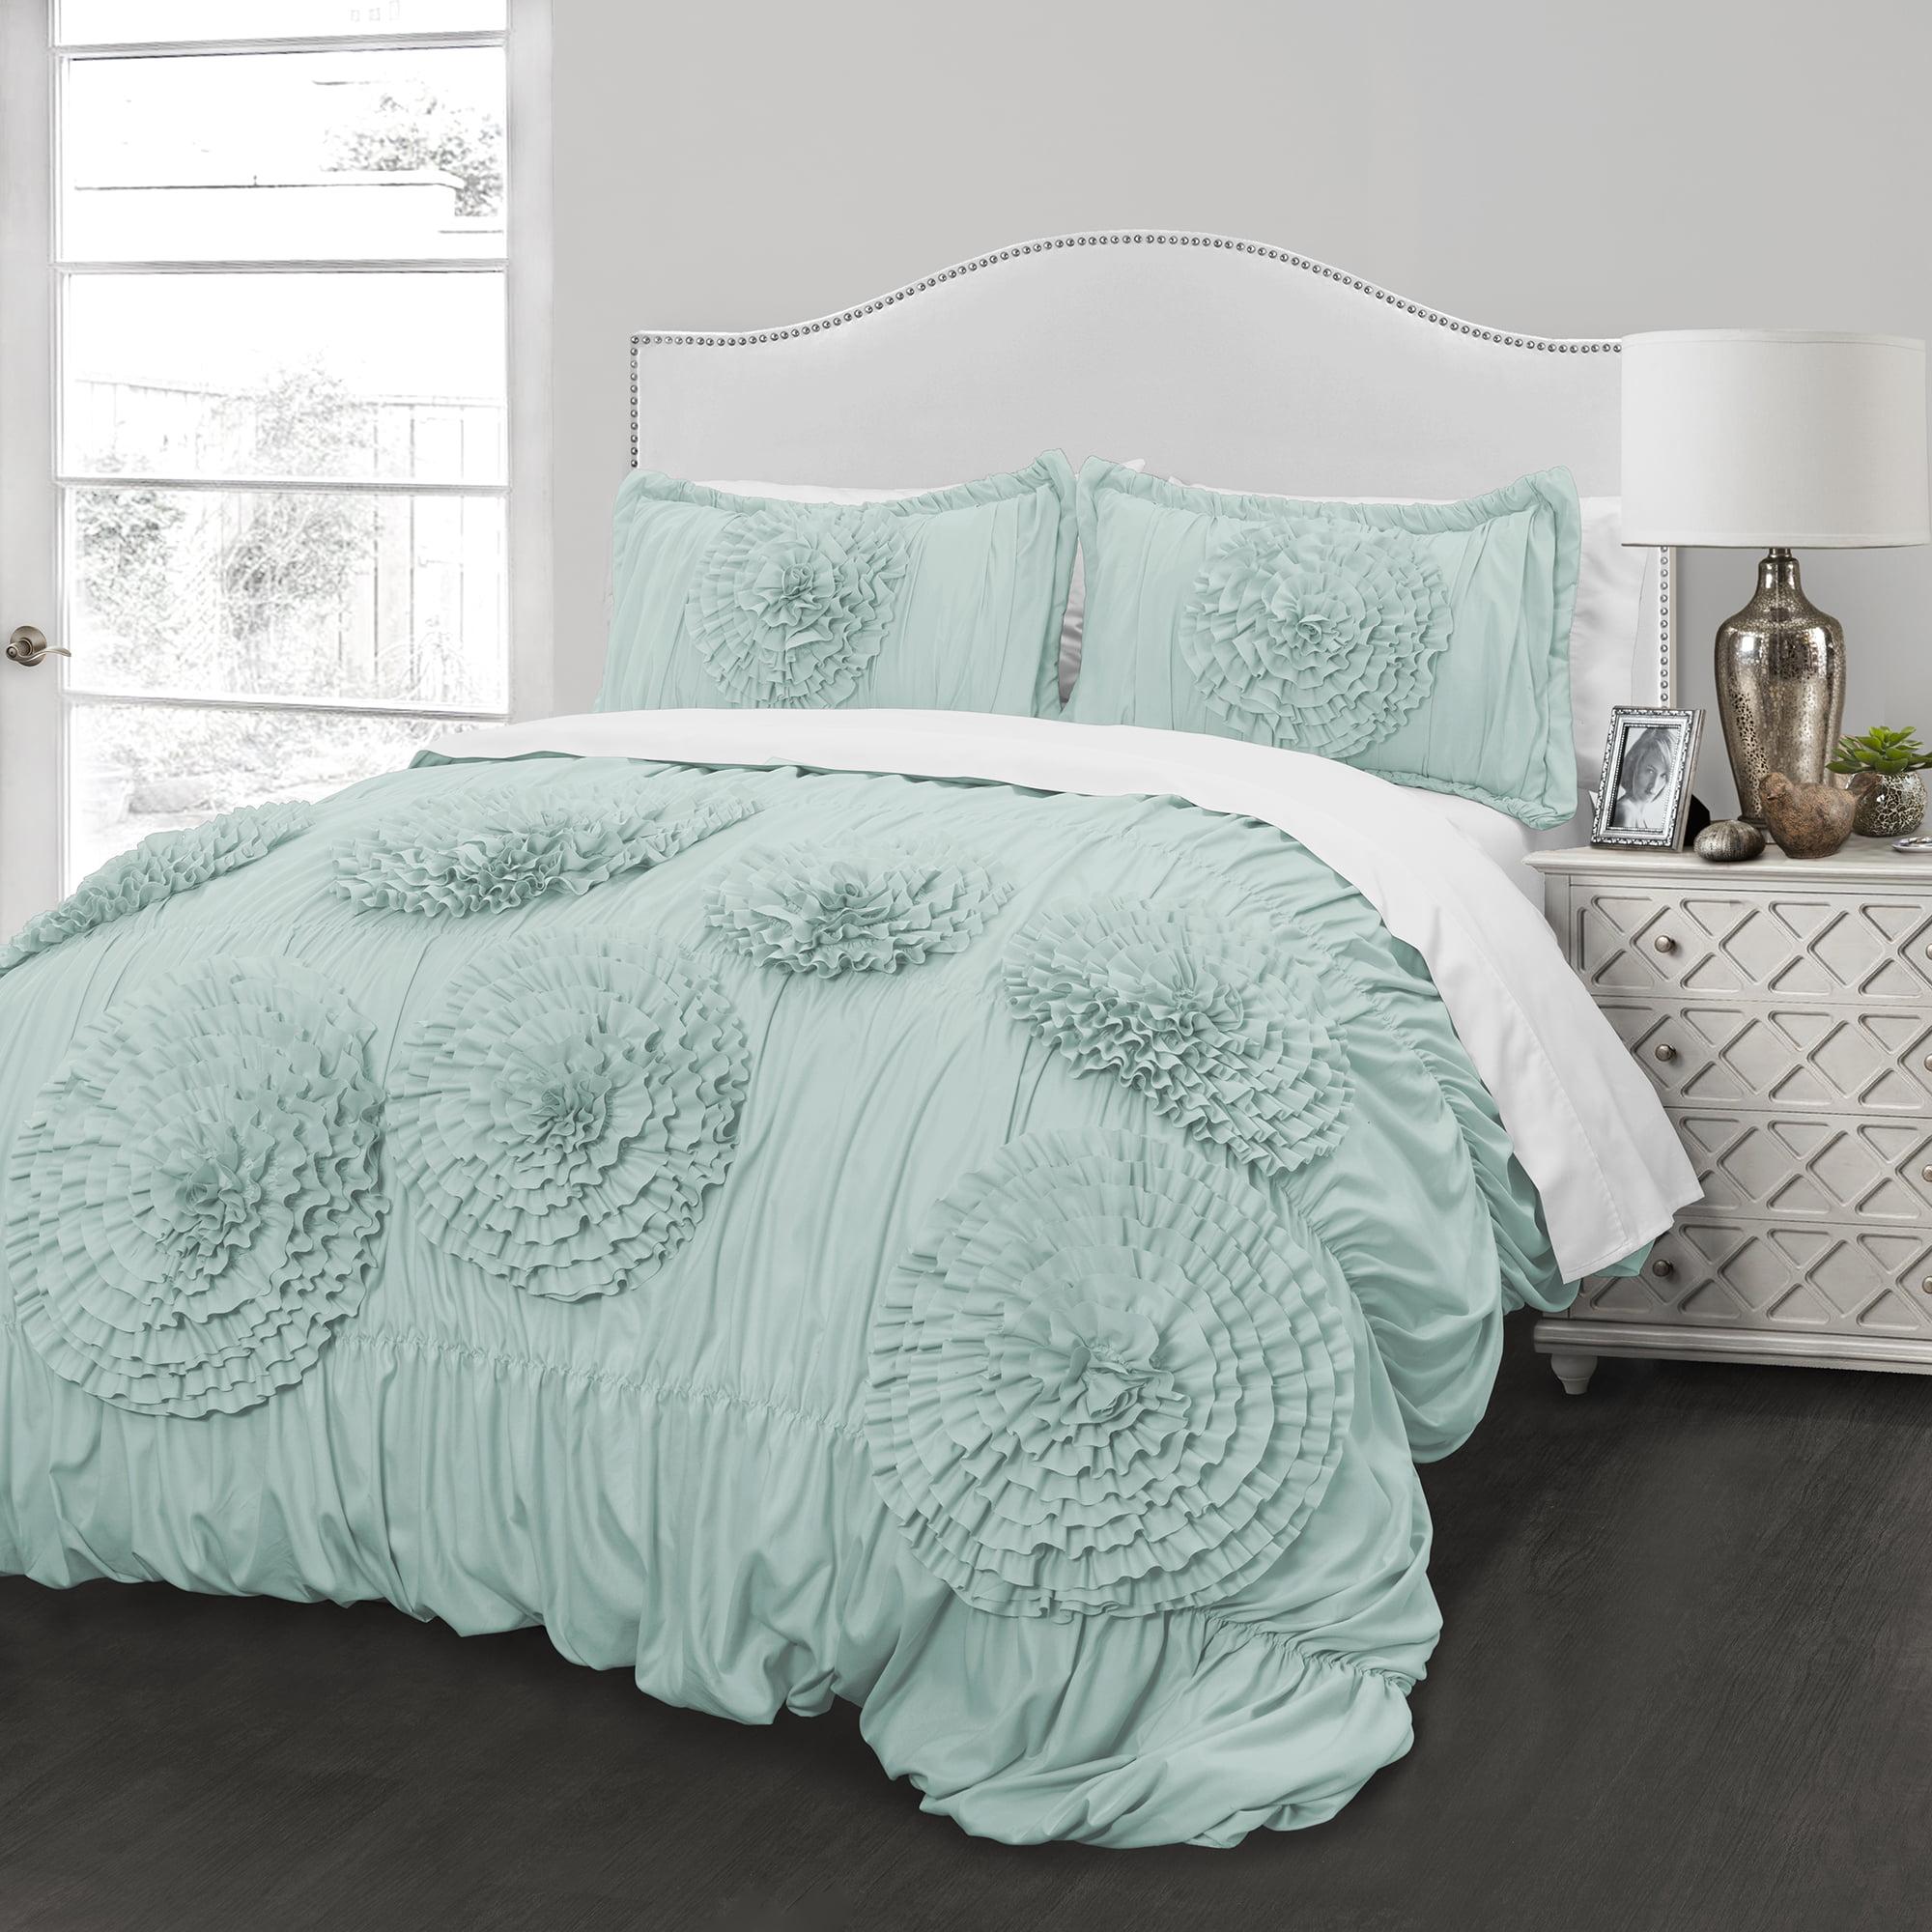 Ruffled Flowers Comforter Set by Better Homes & Gardens